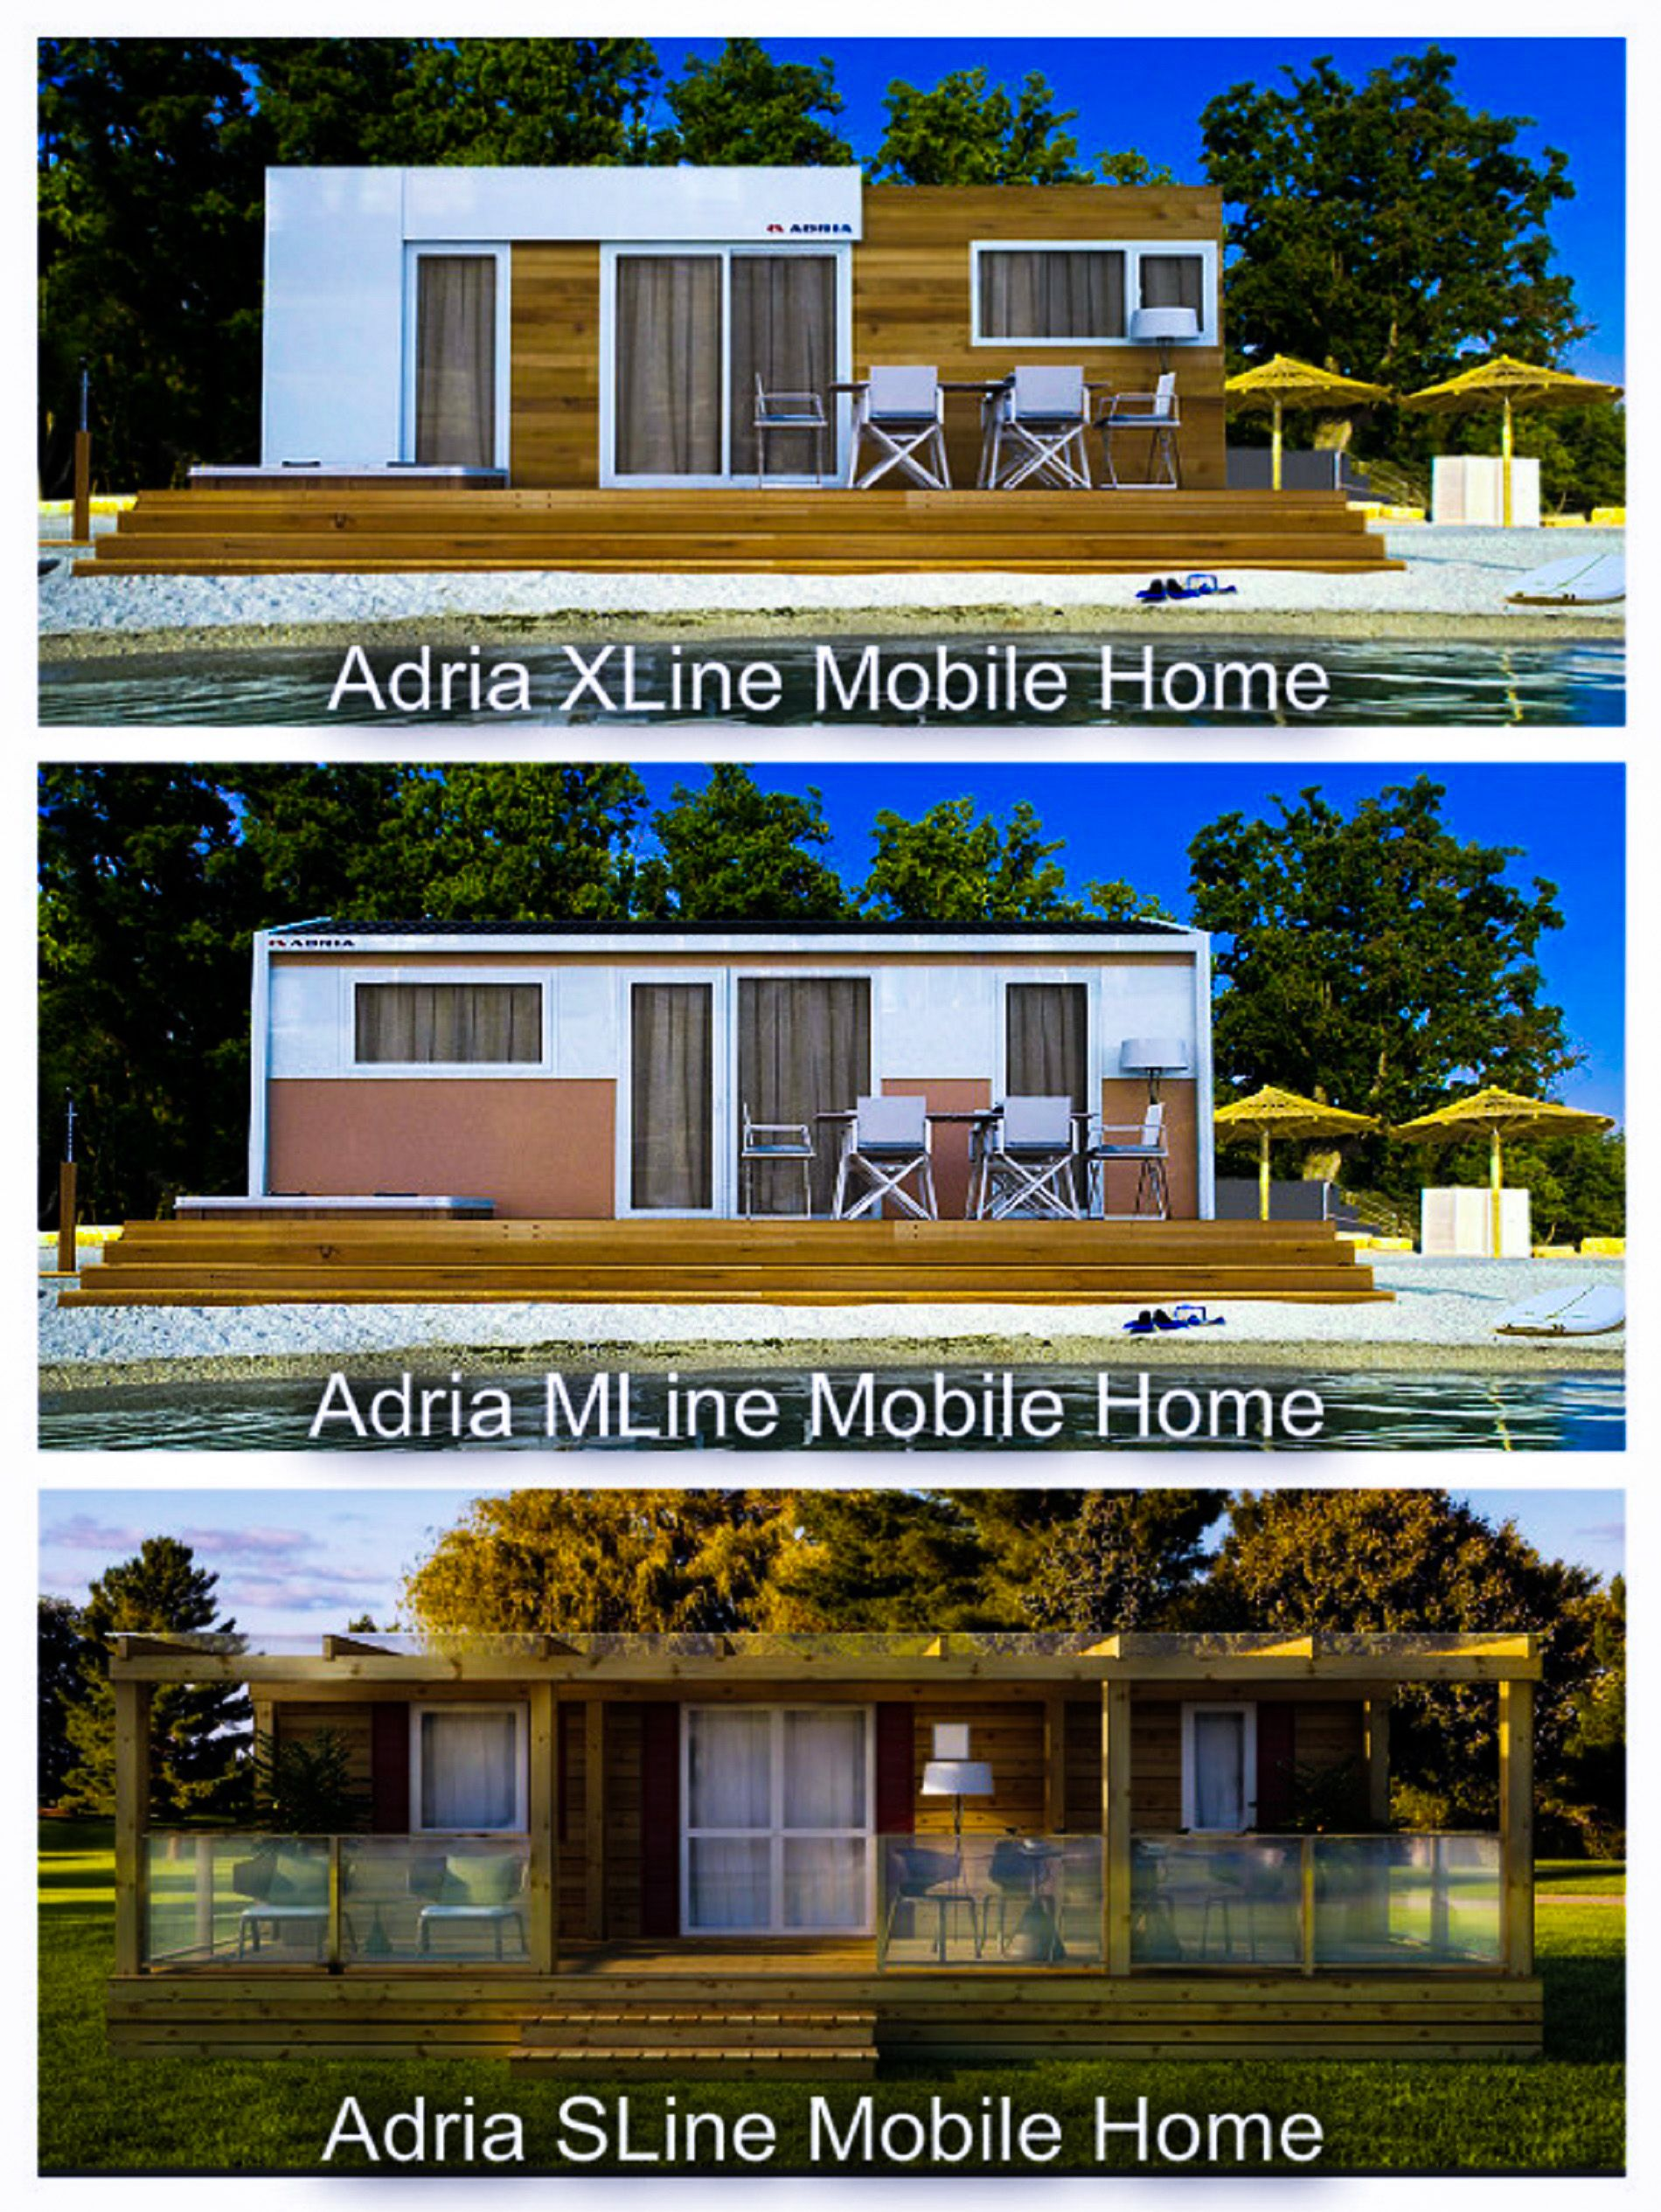 adria mobile homes adria xline mobile home http adria. Black Bedroom Furniture Sets. Home Design Ideas